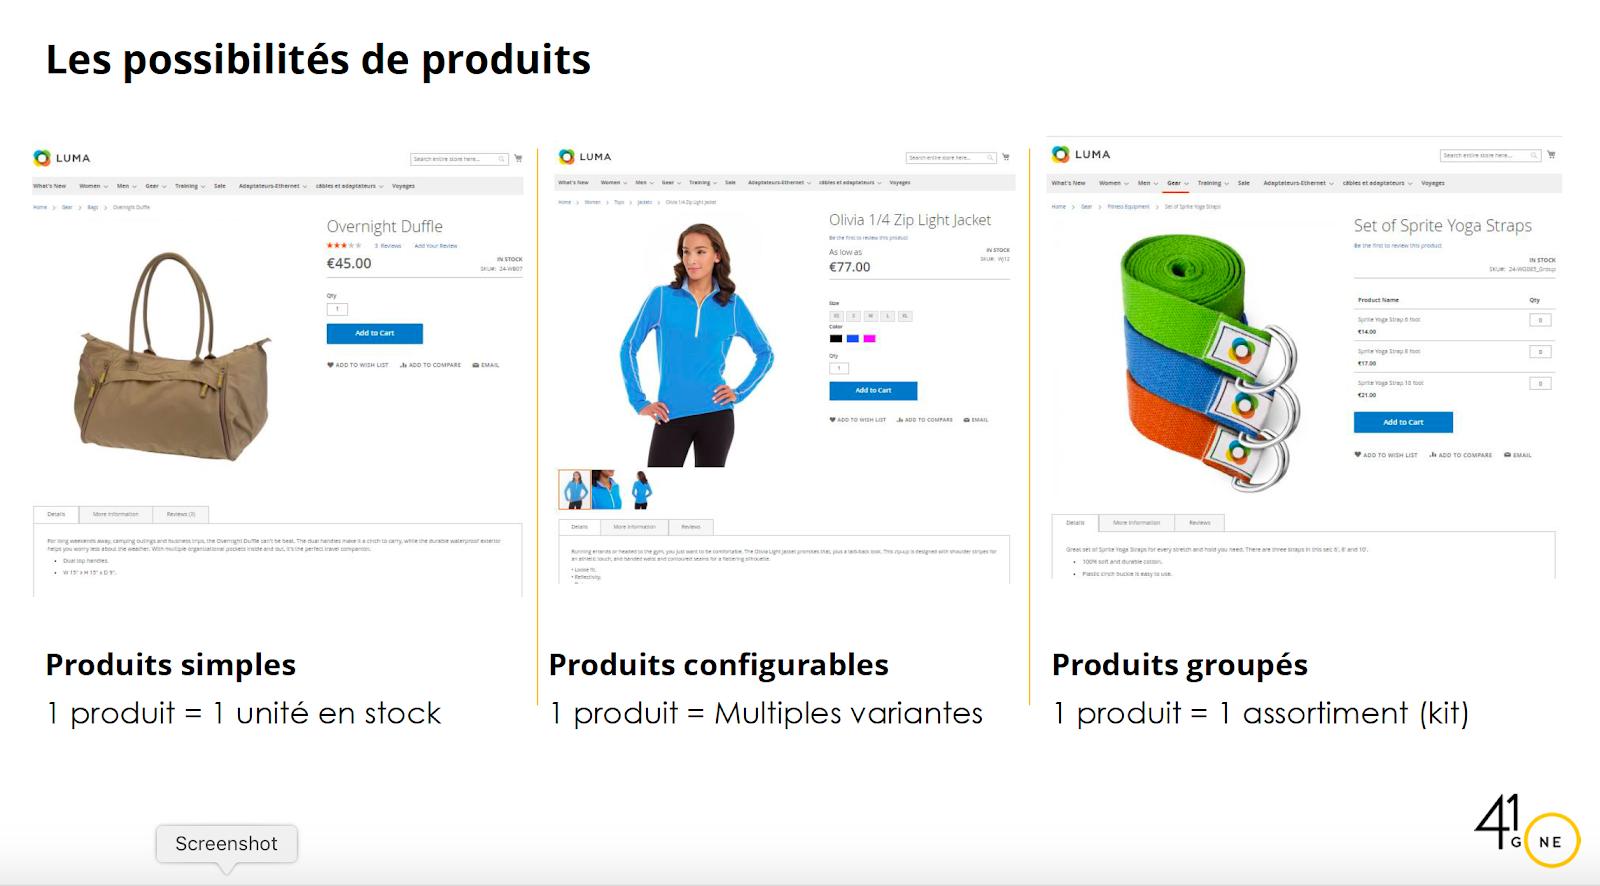 Possibilités de produits Magento